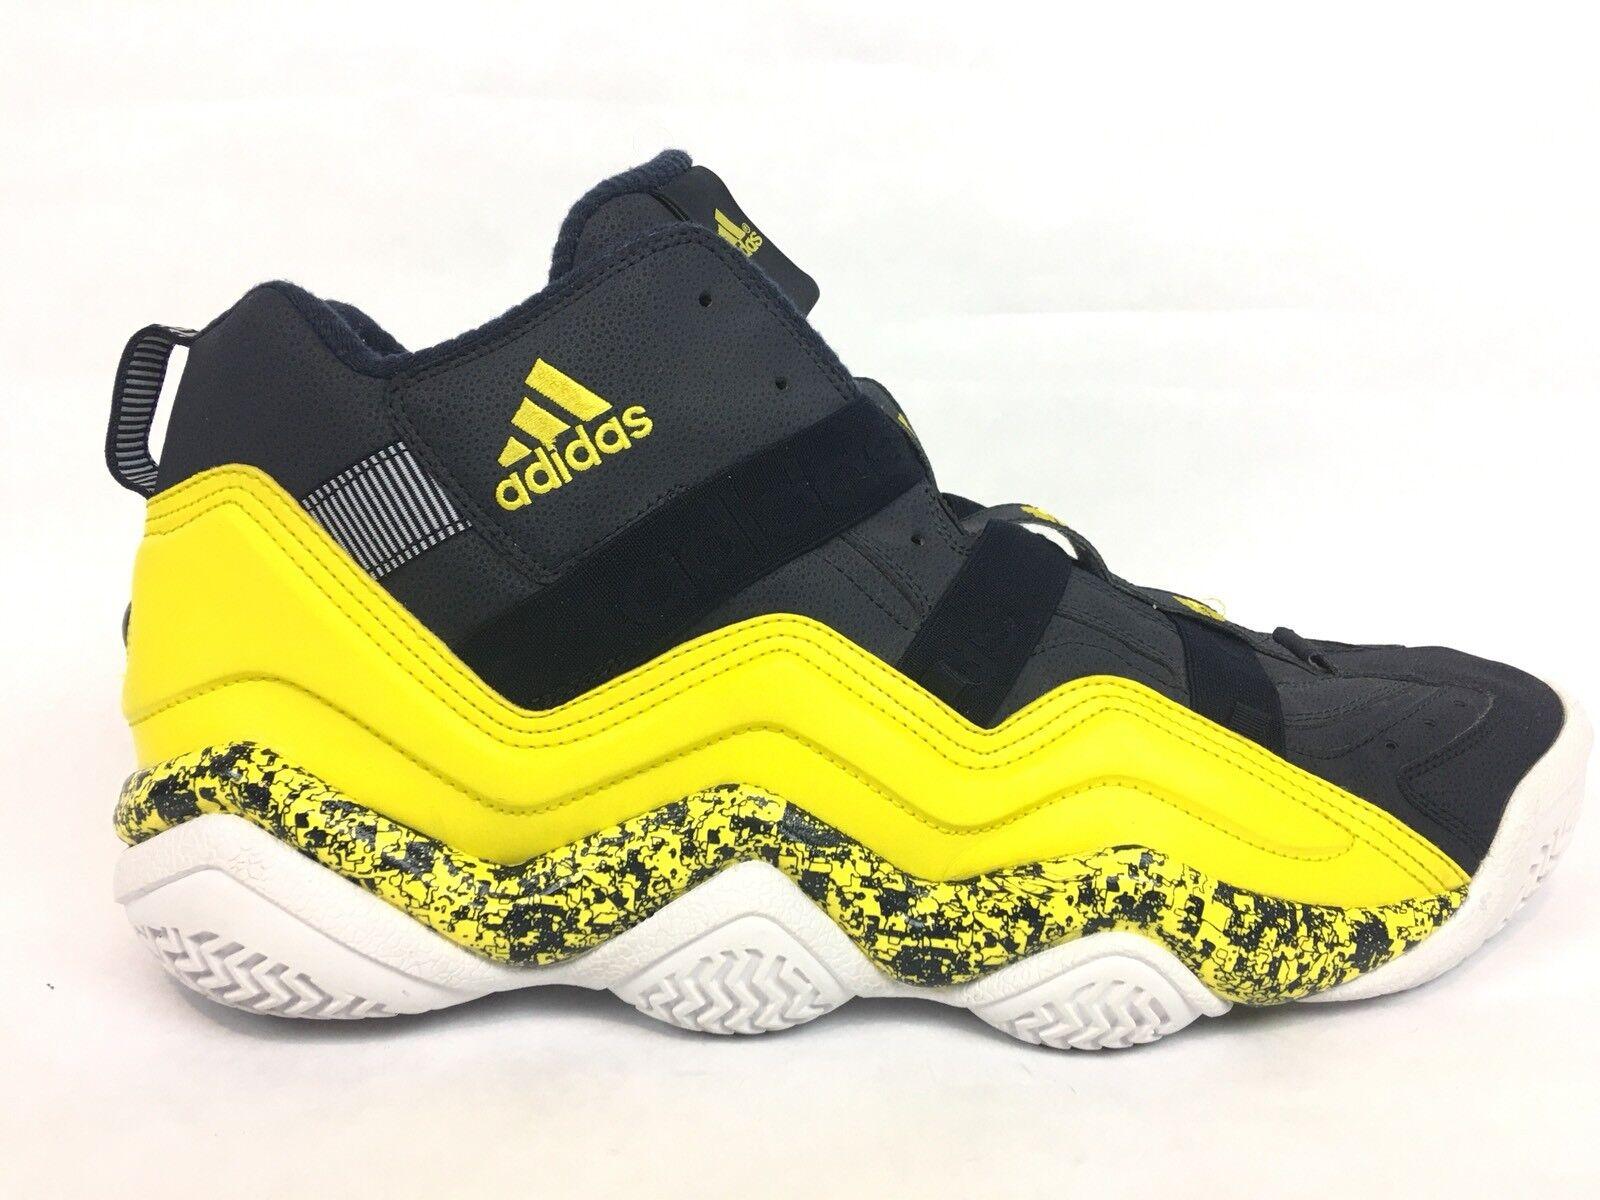 adidas Top Basketball Ten 2000 Kobe Bryant Basketball Top Shoes / Navy Yellow White / Men's 20 ac95bd